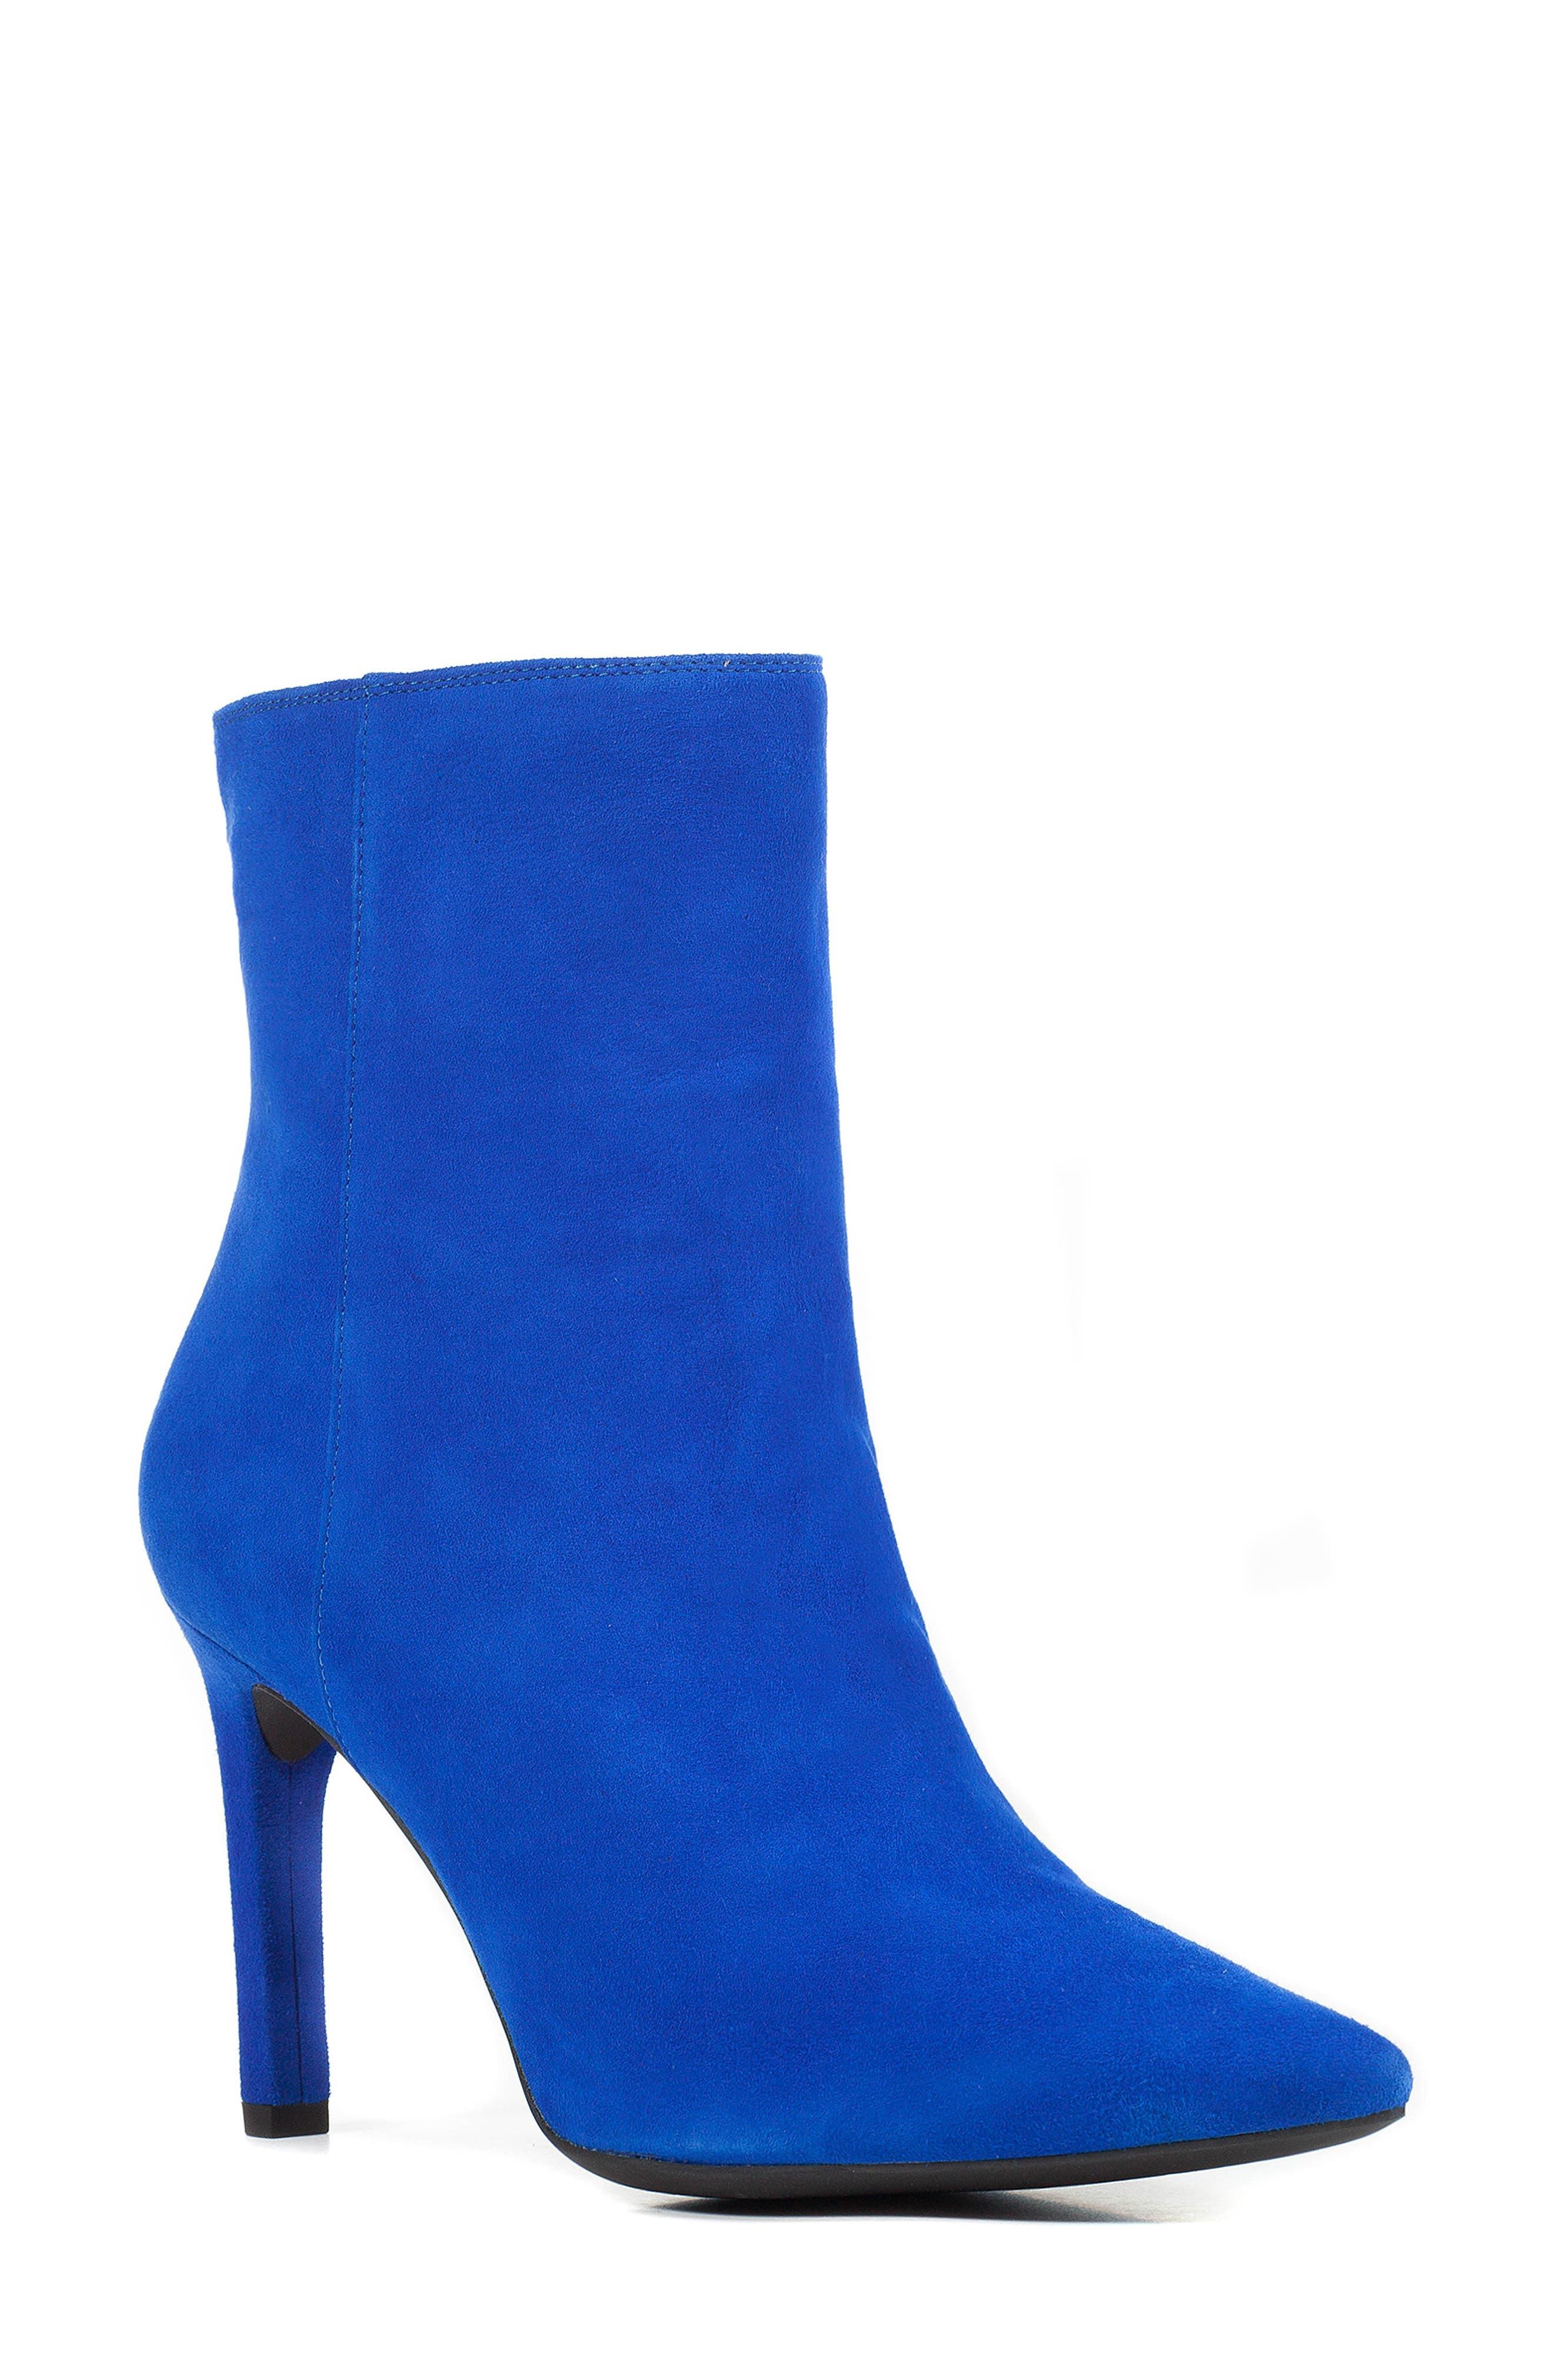 Geox Faviola Bootie, Blue